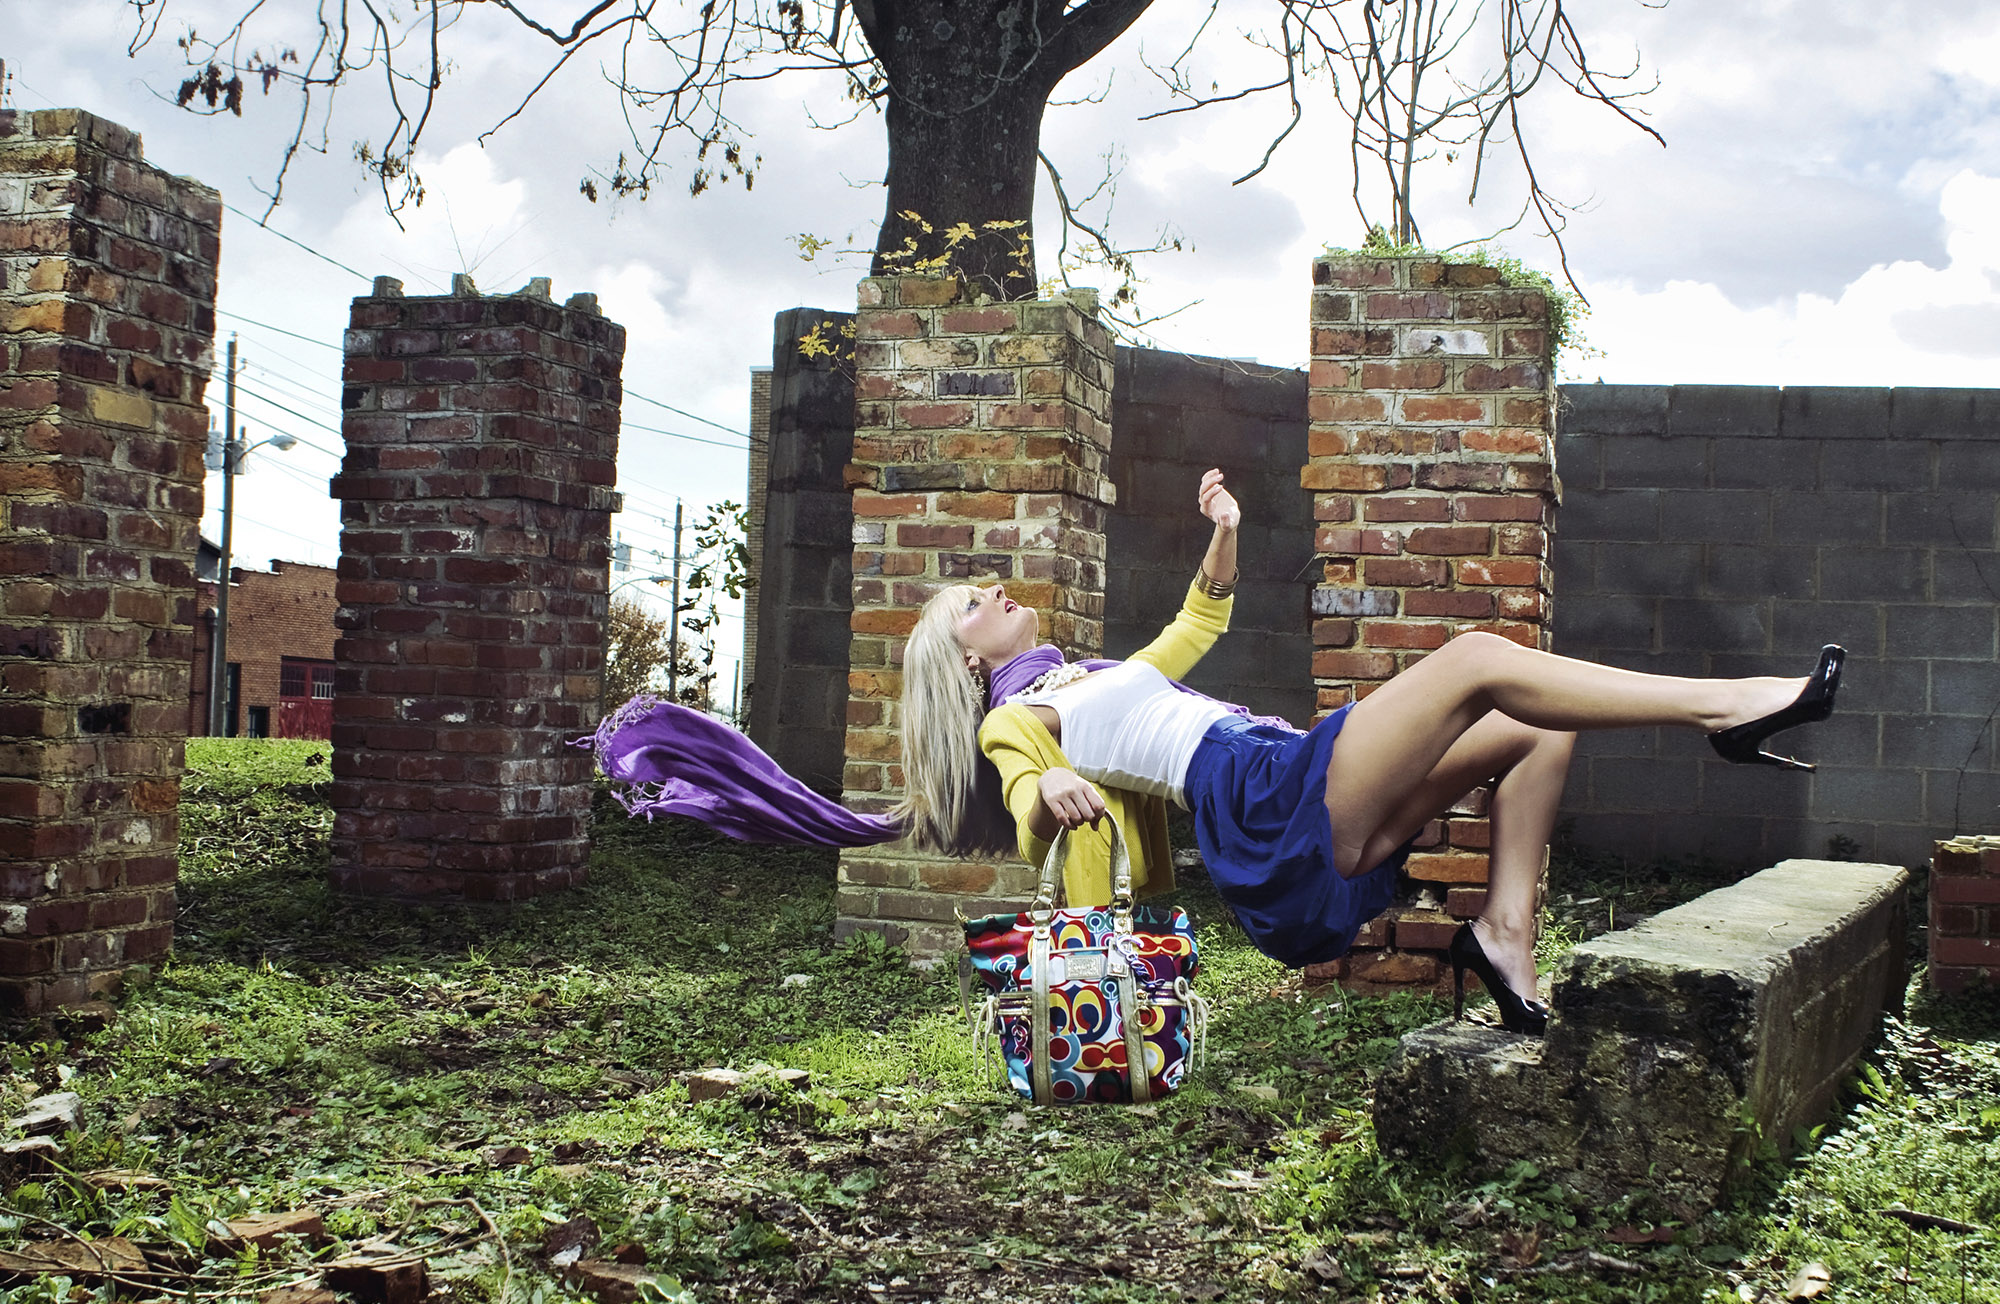 shane_deruise_photography_coach_fashion_editorial.jpg